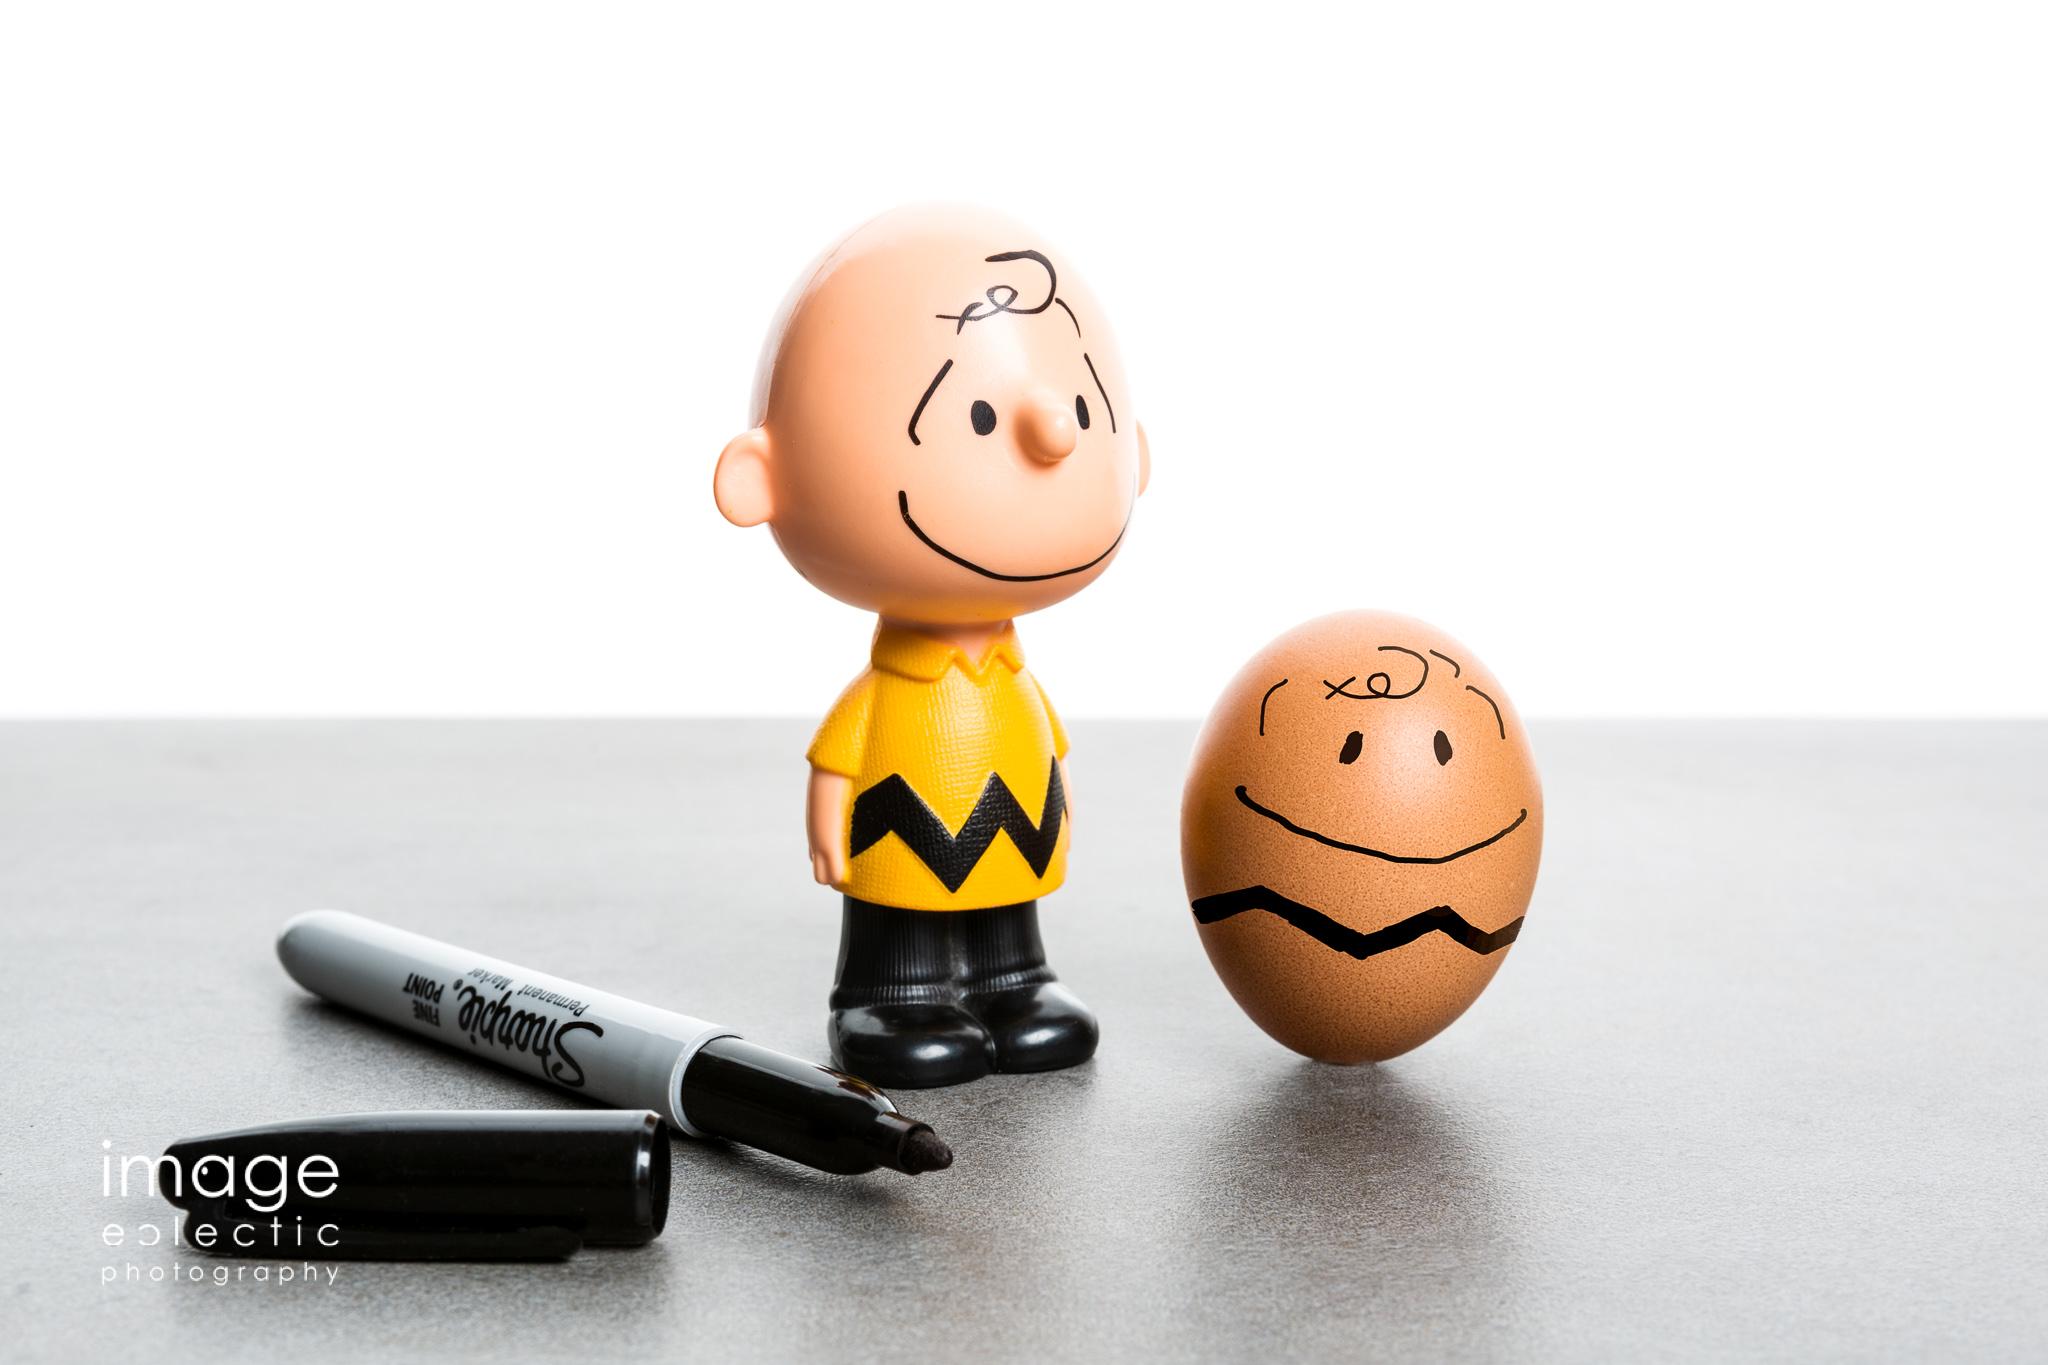 Chuck Plays with an Egg